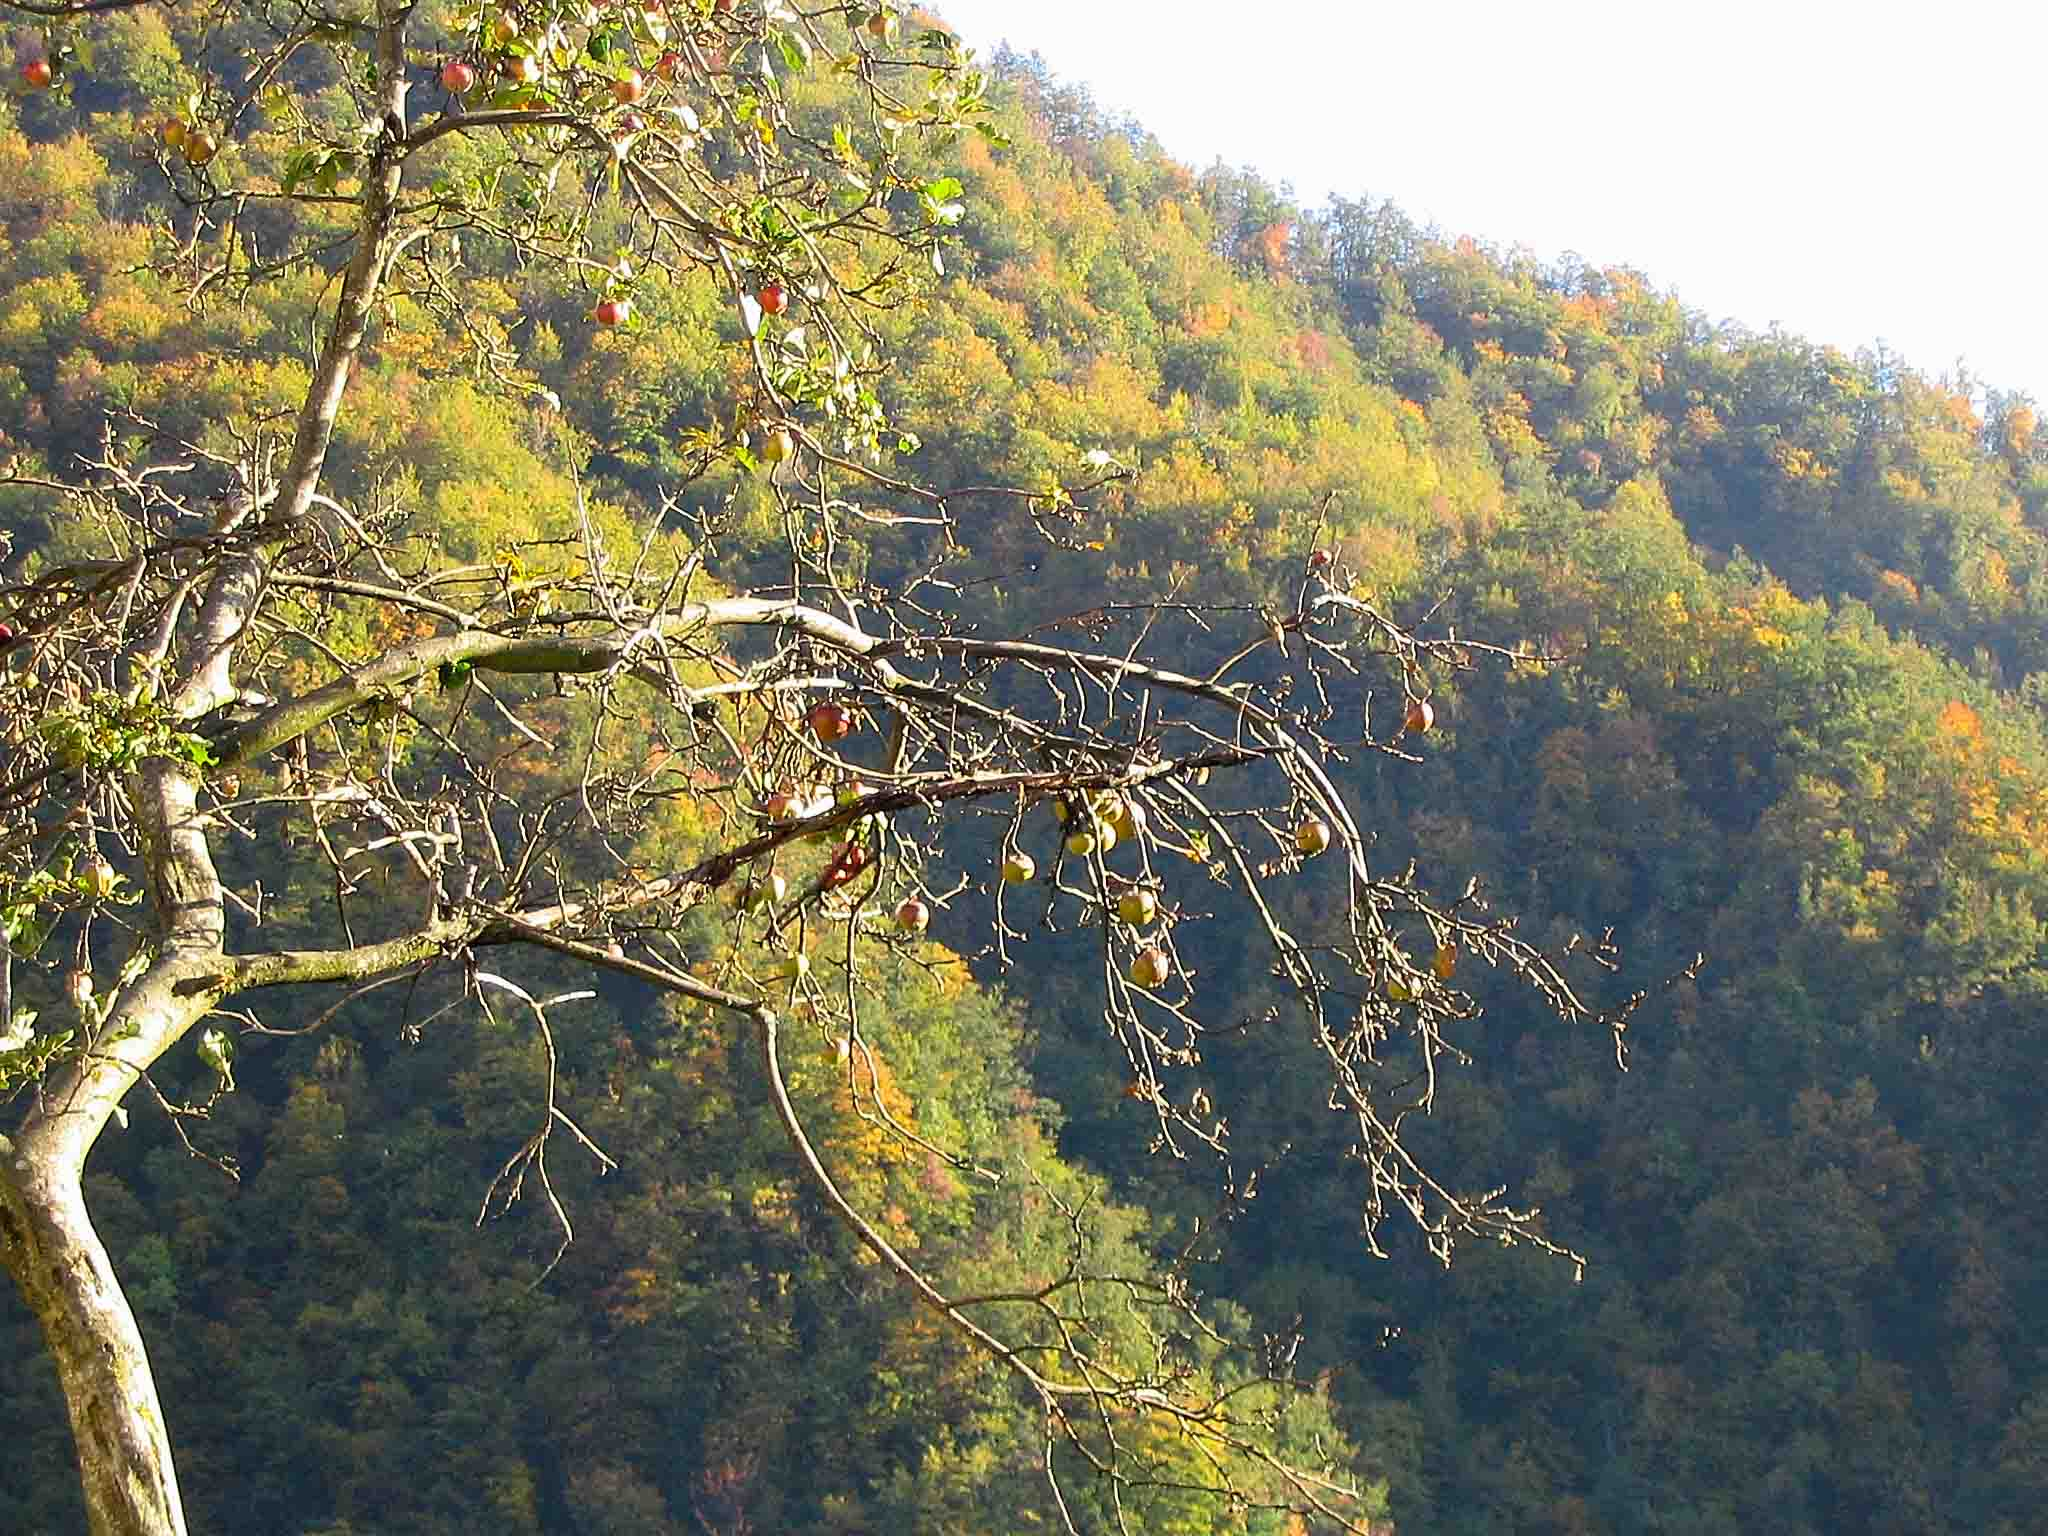 boschi-gialli